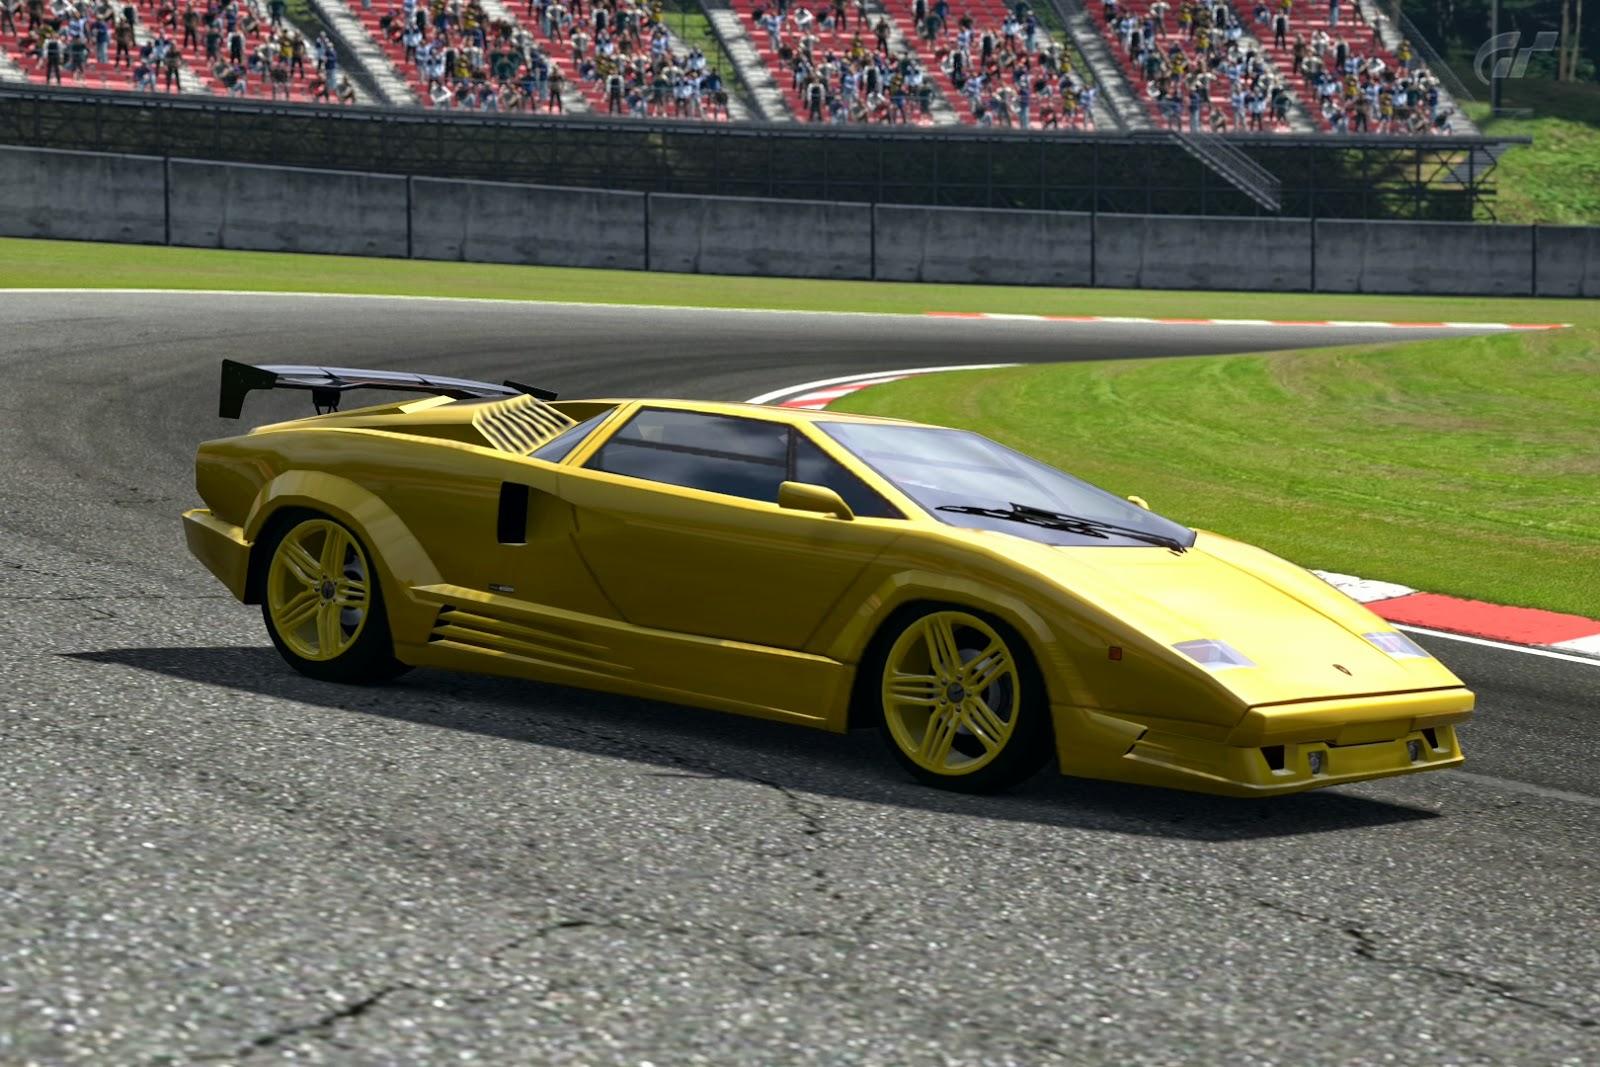 Gt5 Fun 2 Drift Ferrari 430 Scuderia 07 Console Fuchsia